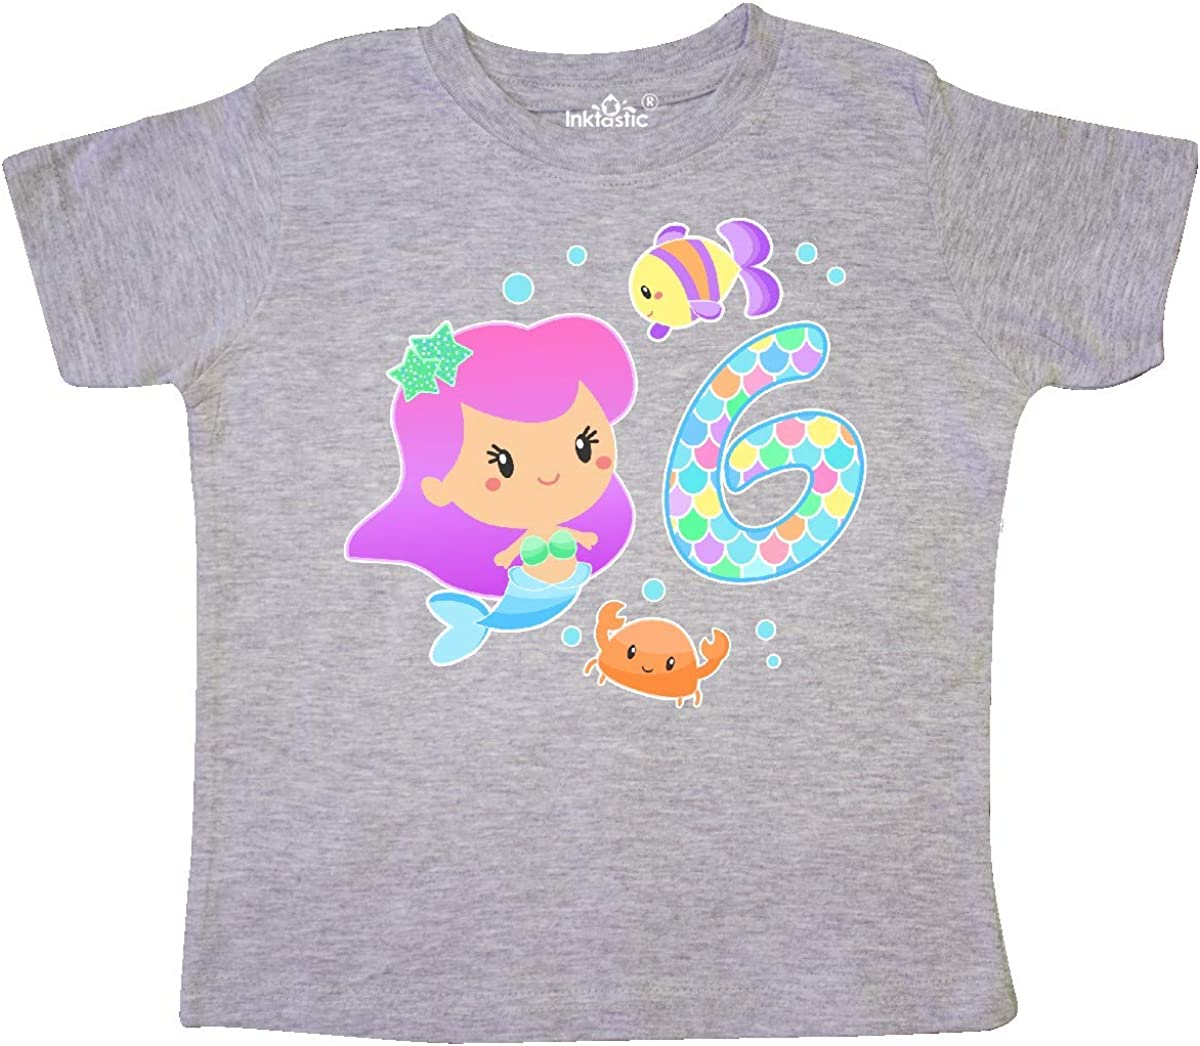 inktastic Sixth Birthday Mermaid with Fish and Crab Toddler T-Shirt